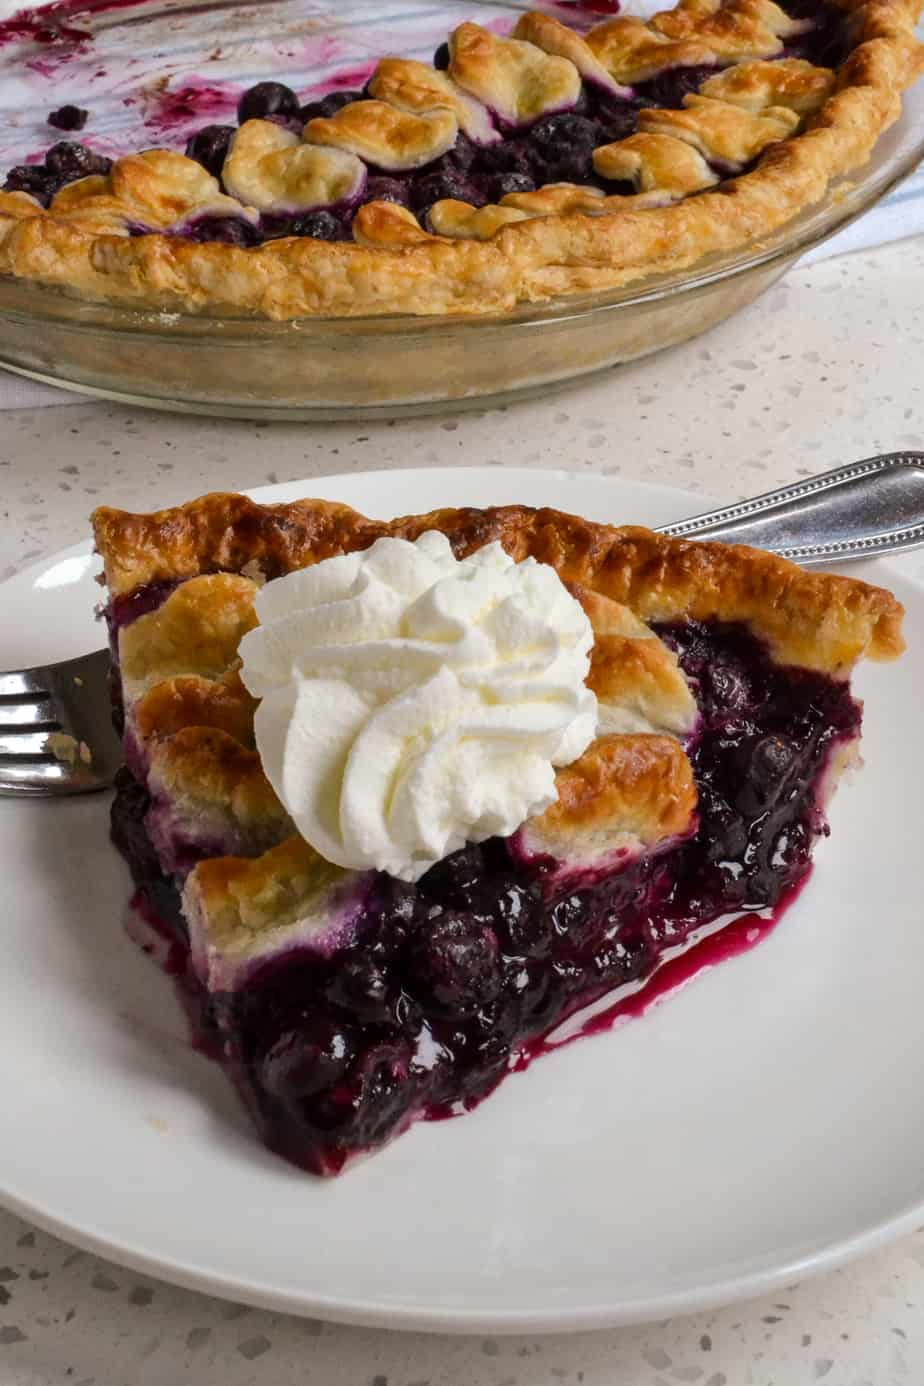 A slice of homemade blueberry pie